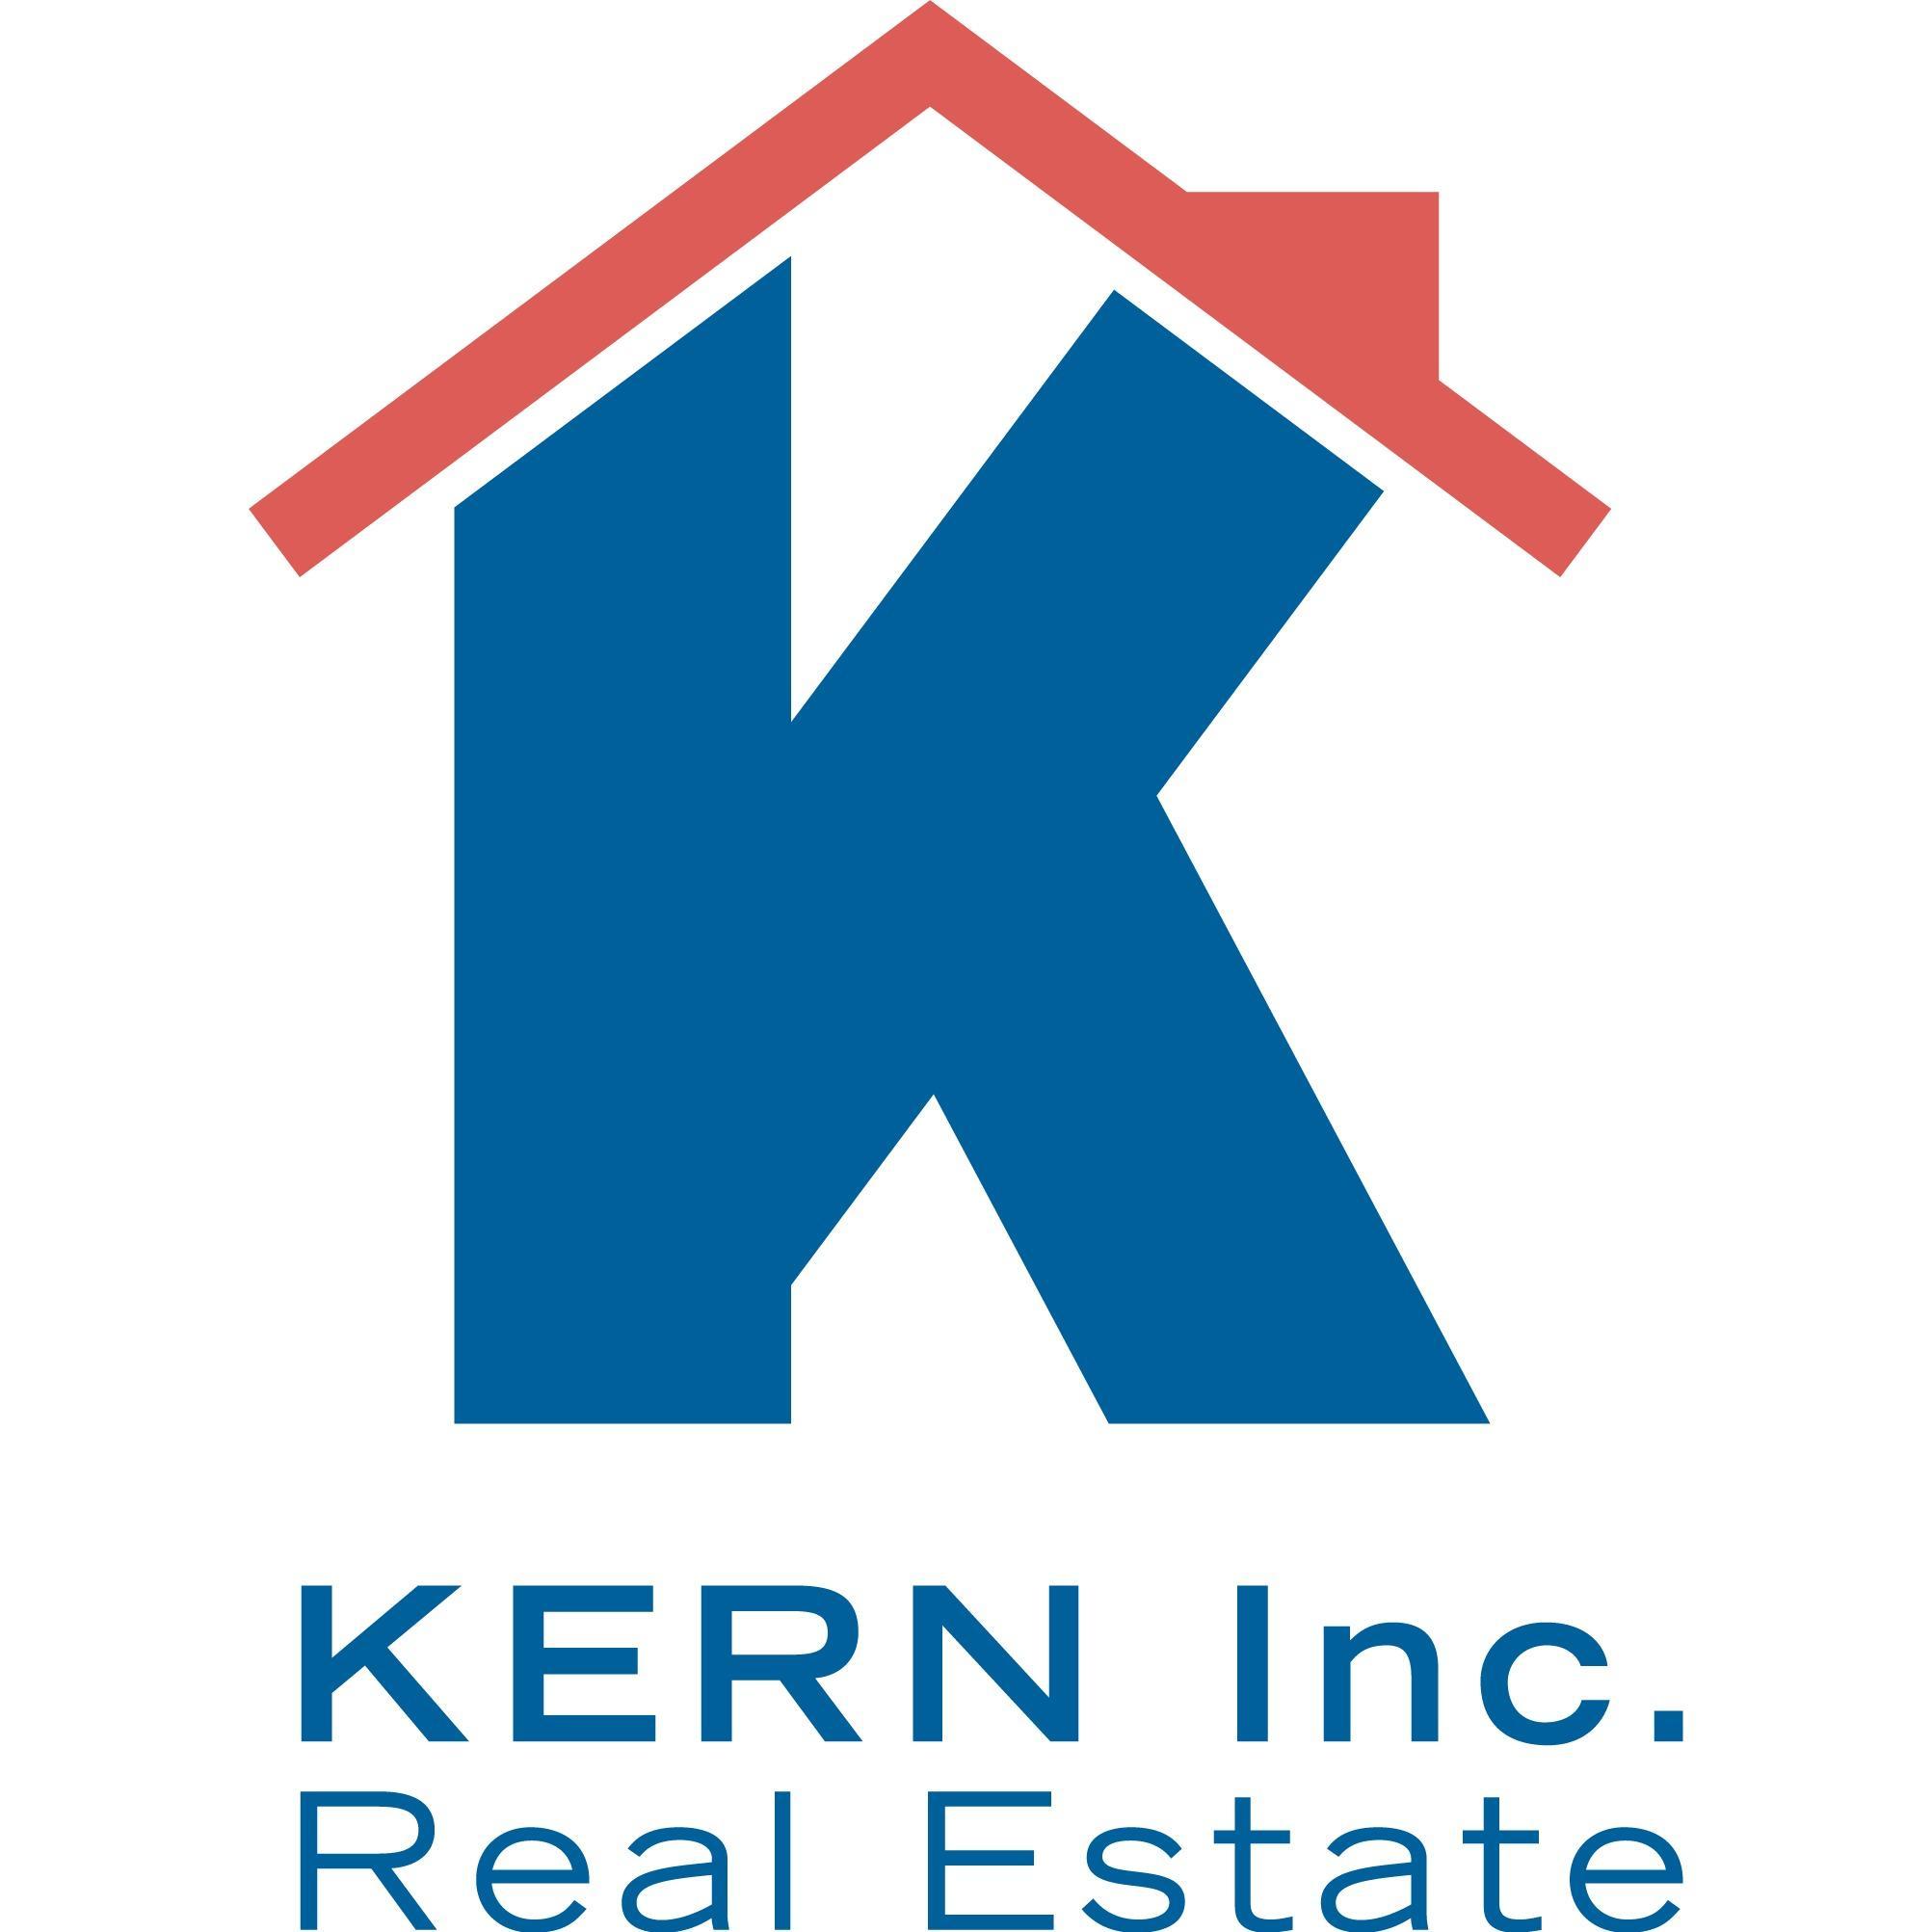 KERN Inc. Real Estate - Michelle Kern - Lawrence, KS 66049 - (785)331-8430 | ShowMeLocal.com